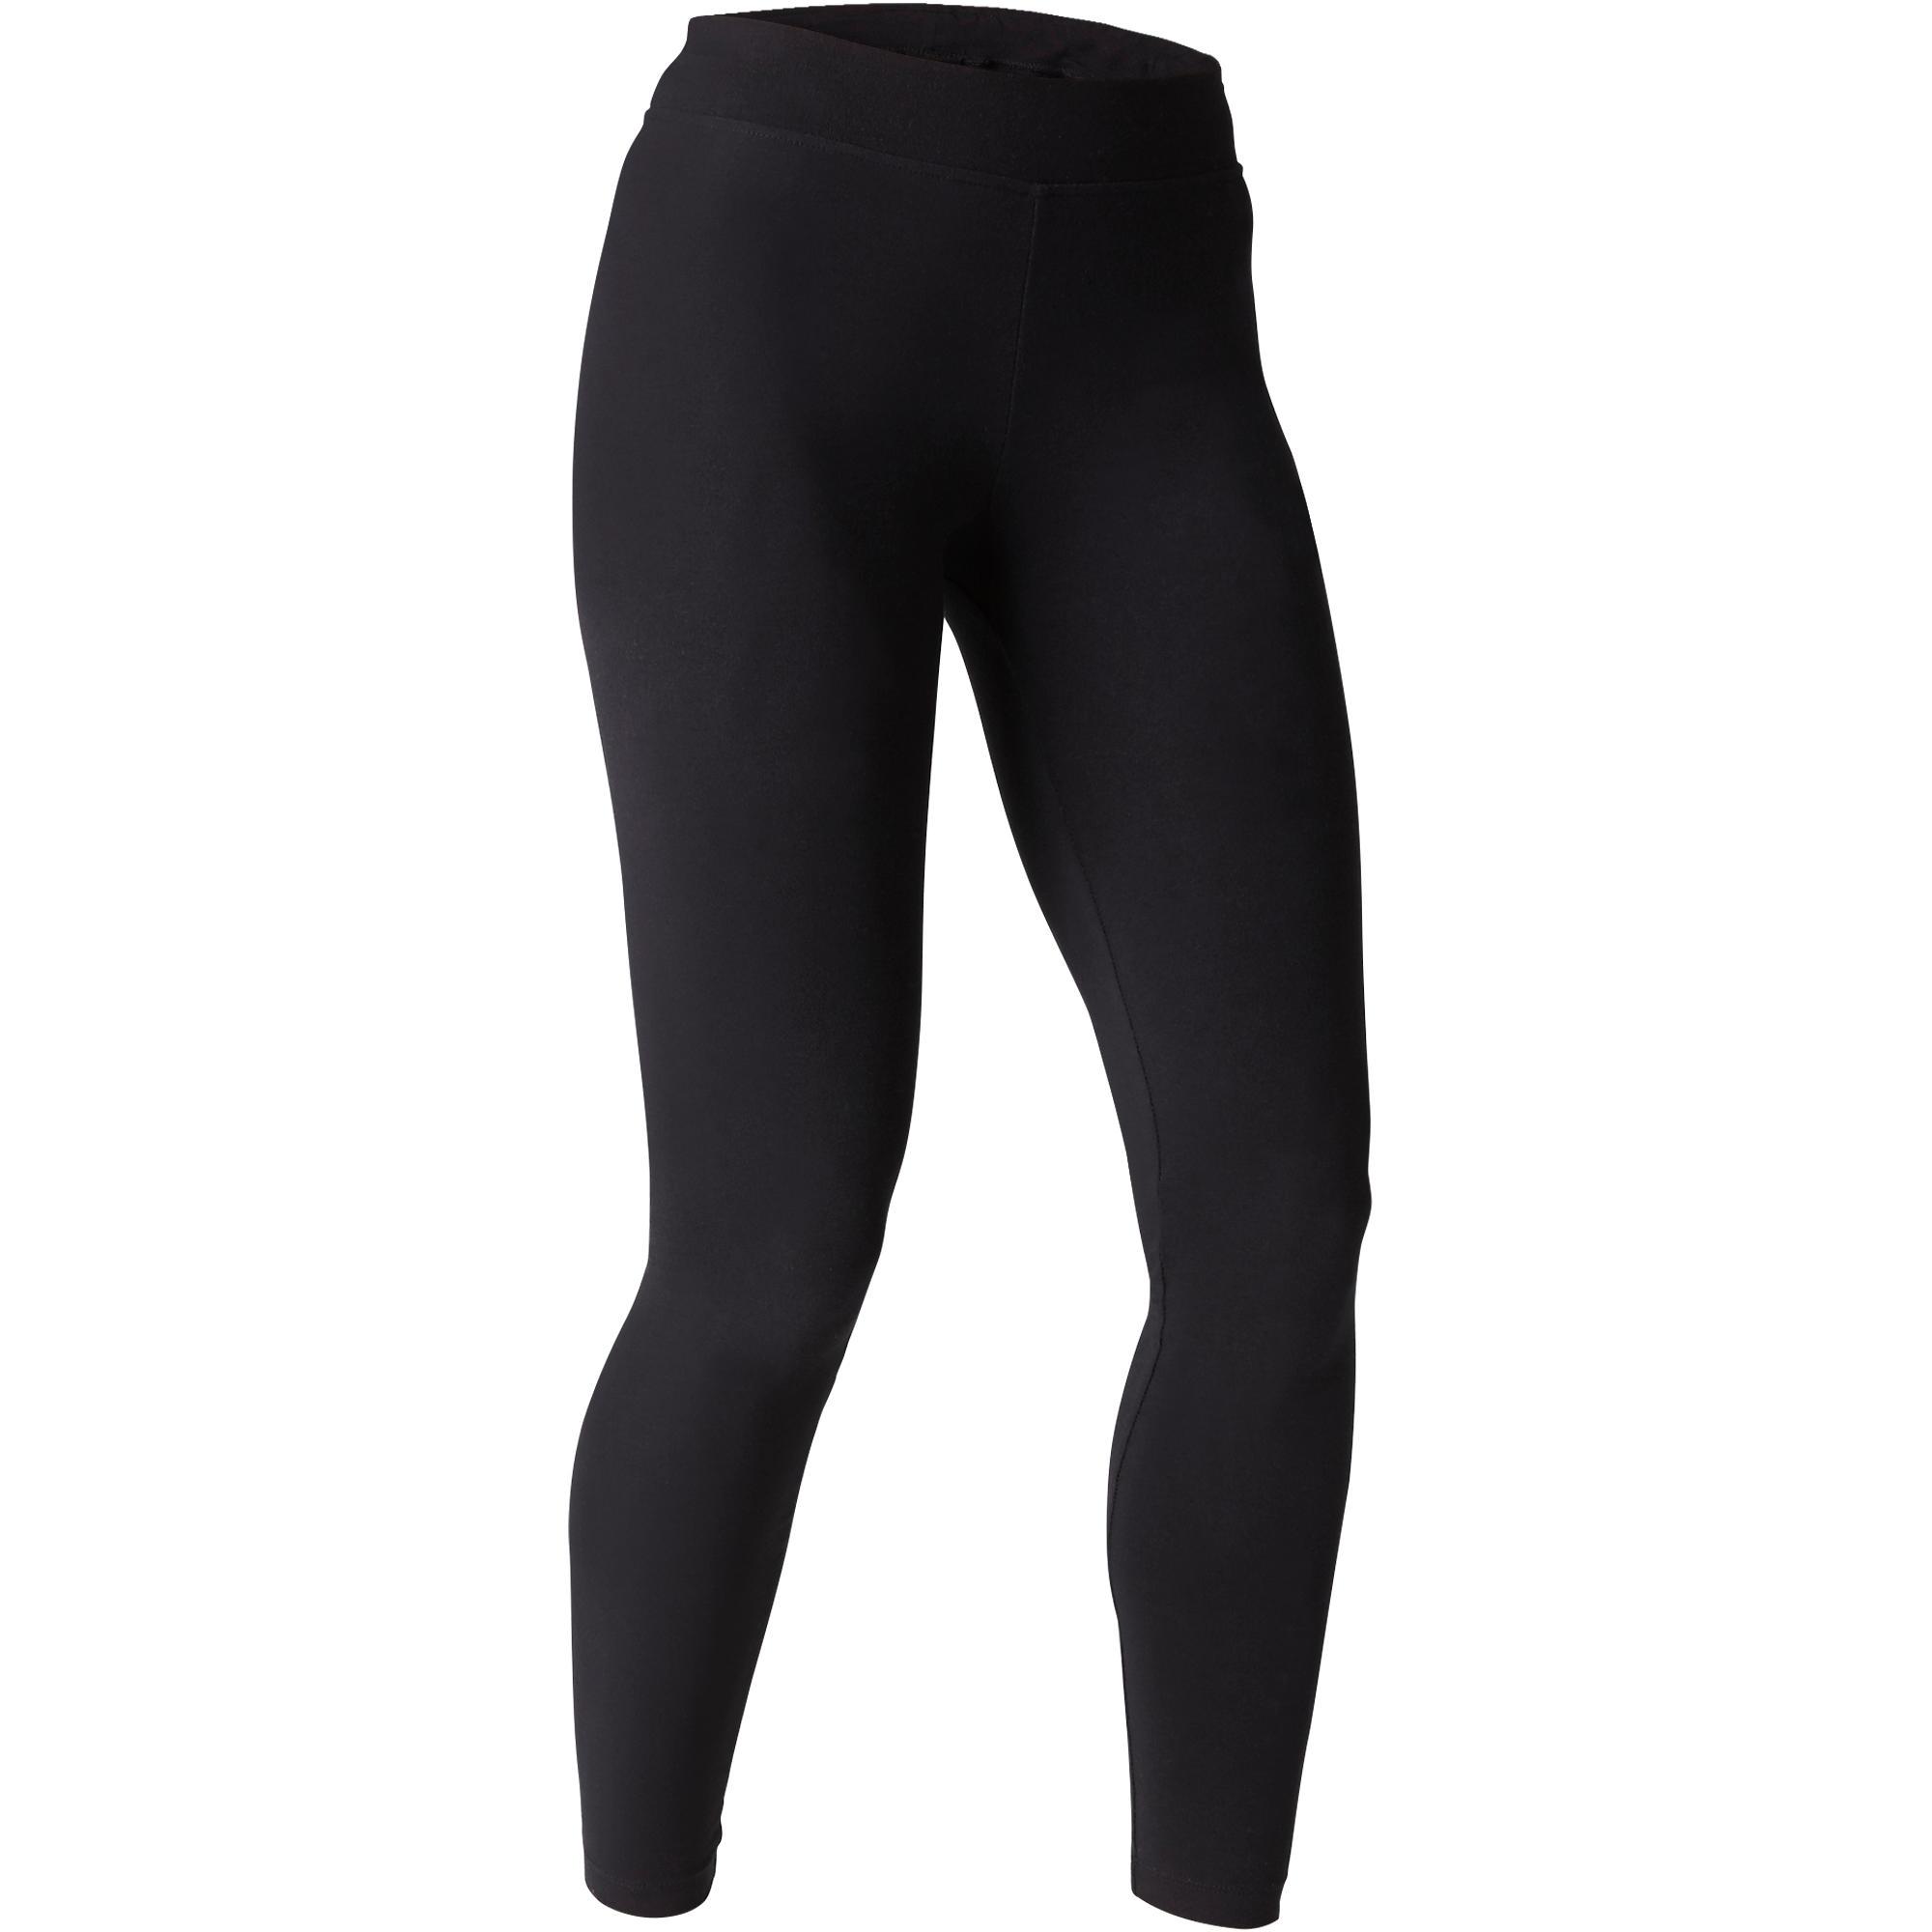 Leggings Fit+ 500 slim Pilates y Gimnasia suave mujer negro